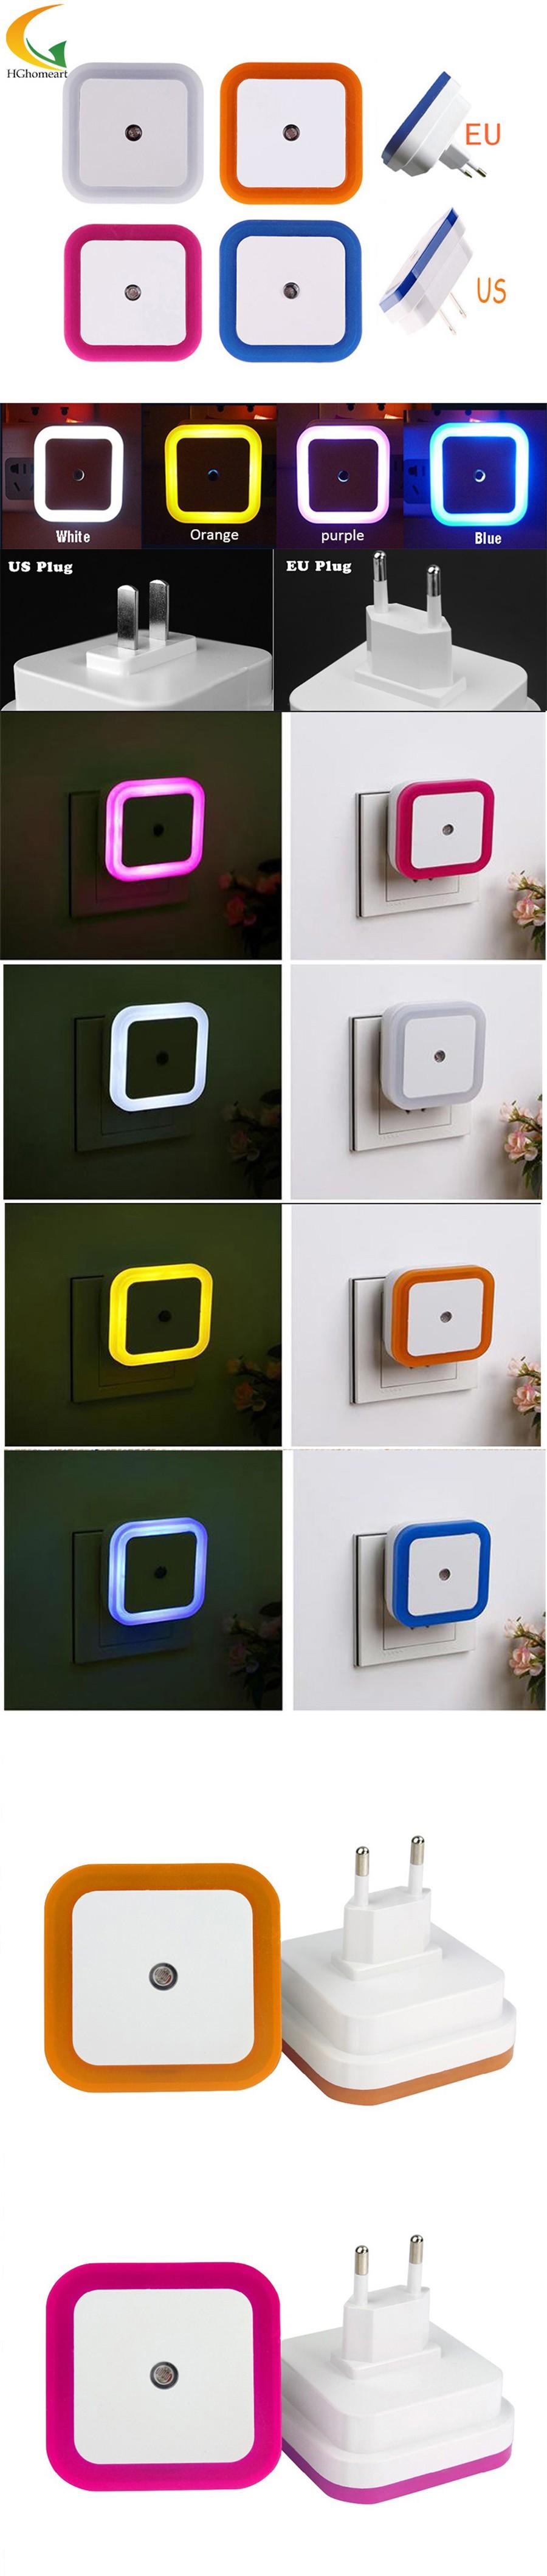 baby room LED night light with motion sensor light EU US ...